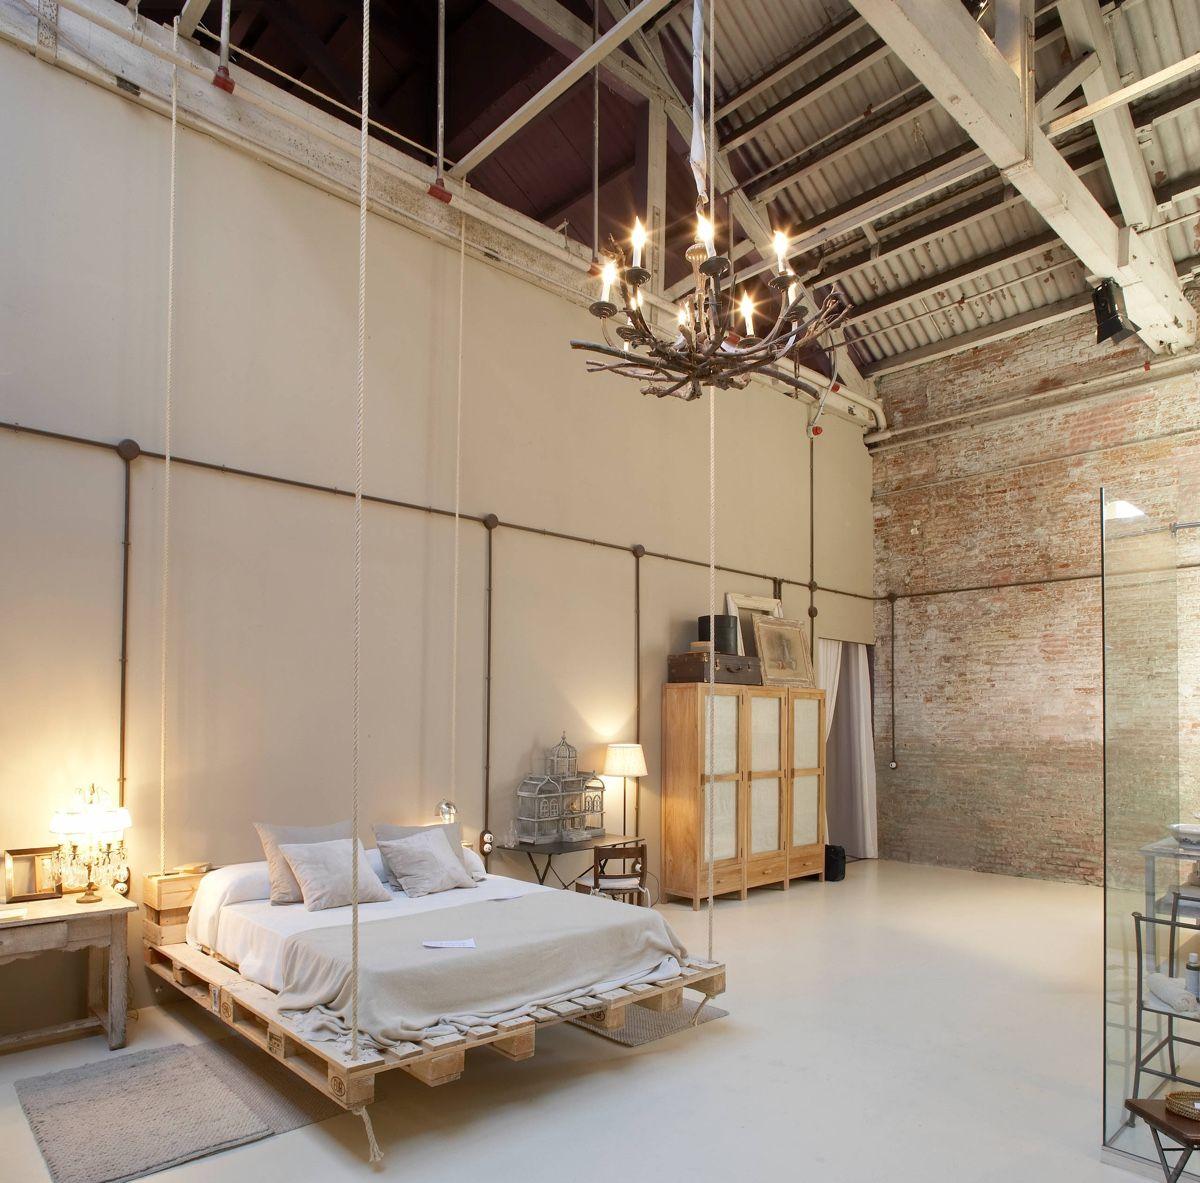 bedrooms with exposed brick walls | interior design. bedroom